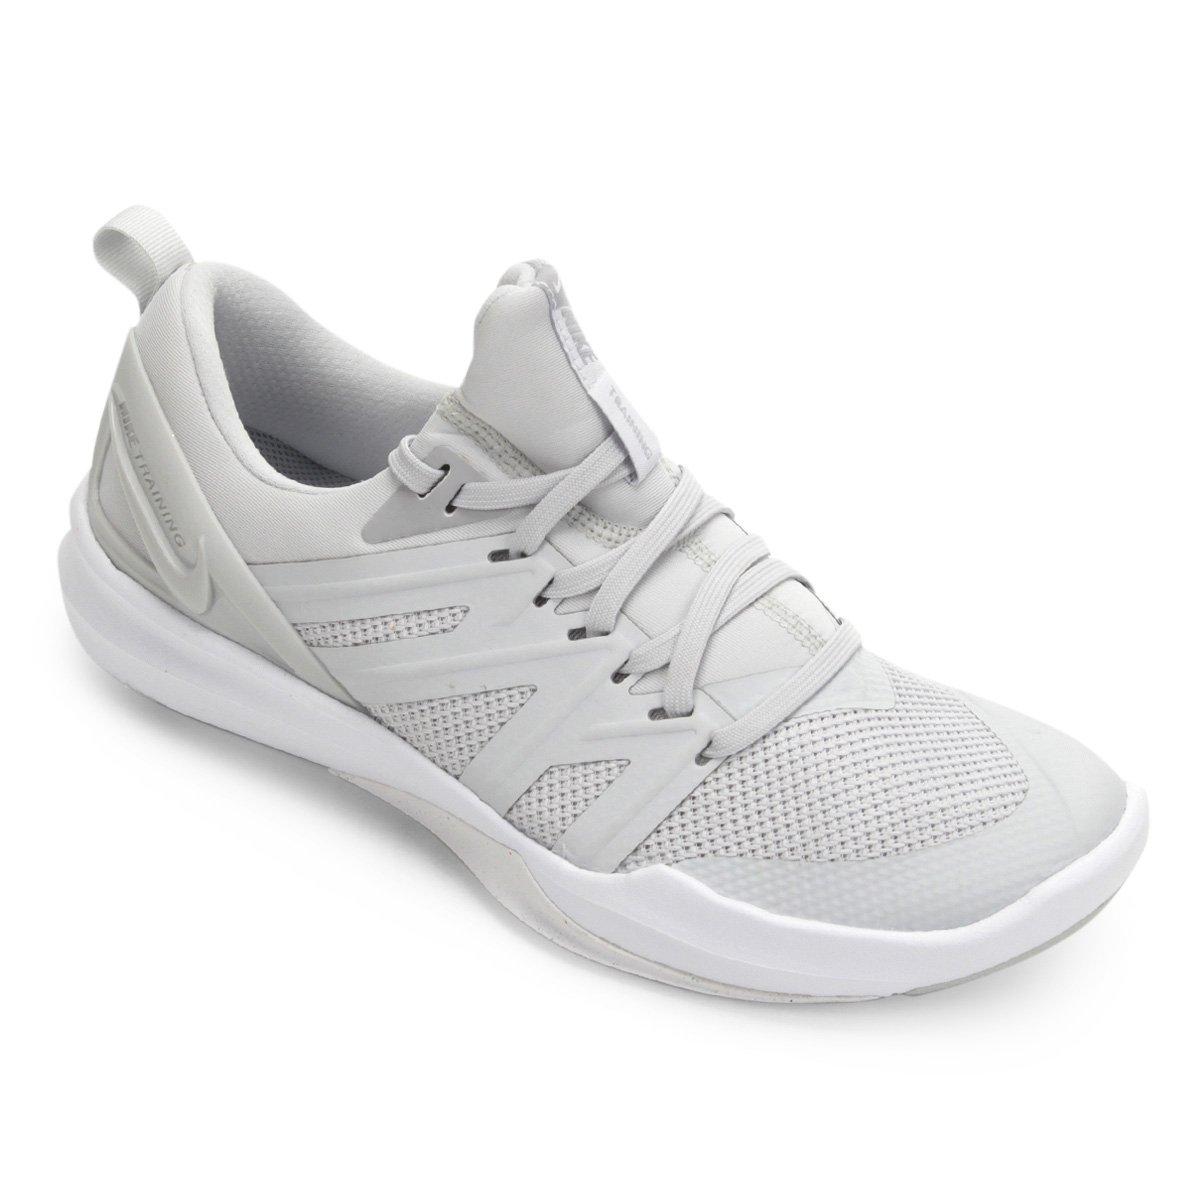 6524dd66630 Tênis Nike Victory Elite Trainer Masculino - Prata - Compre Agora ...